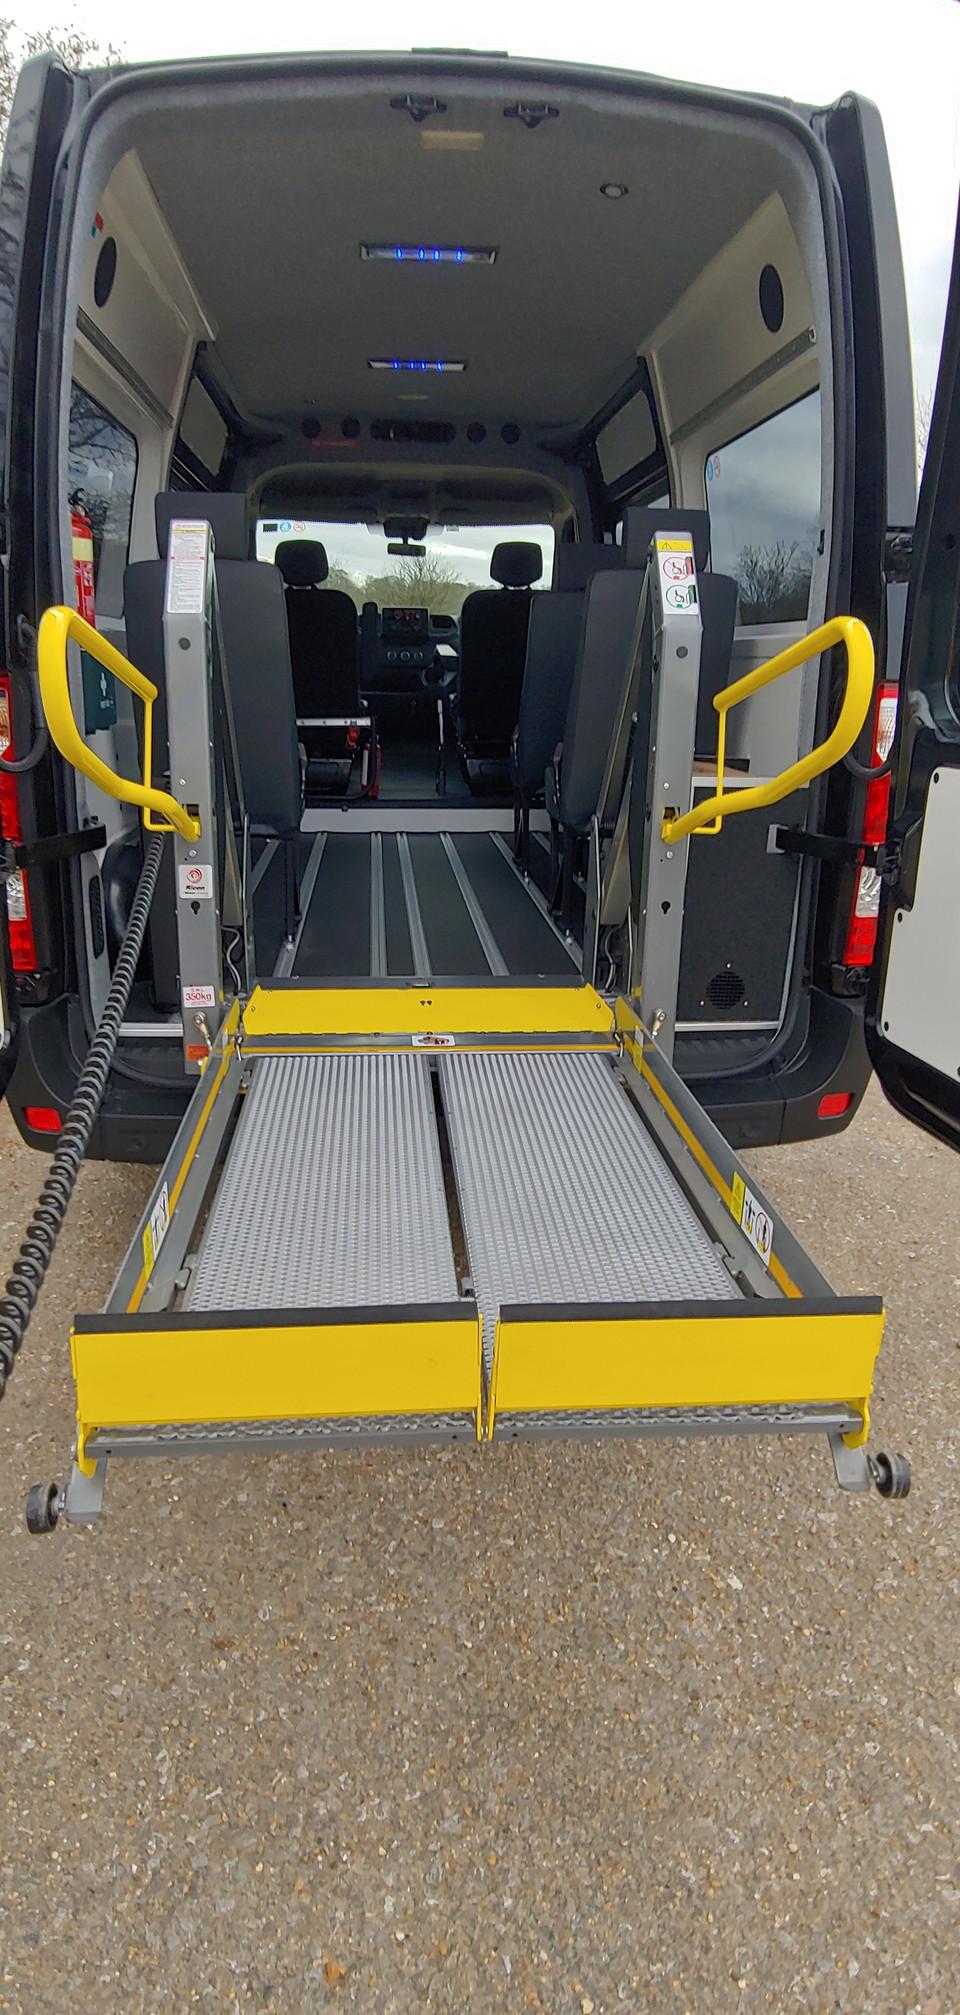 Tail lift deploying in Warnerbus conversion